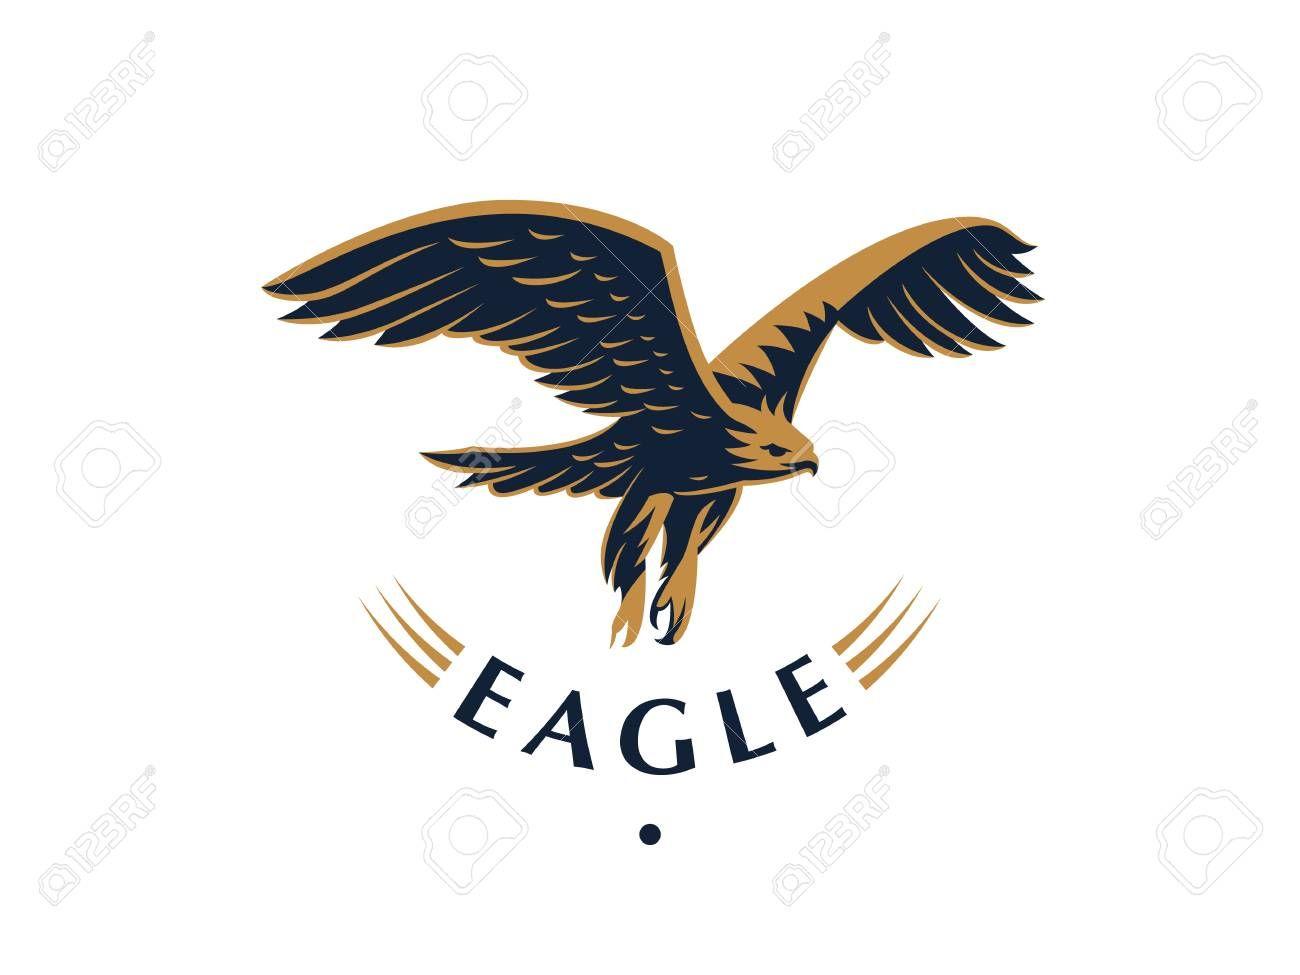 The Flying Eagle Hawk Bird Logo Vector Emblem Sponsored Hawk Eagle Flying Bird Emblem In 2020 Card Design Business Advertising Design Card Templates